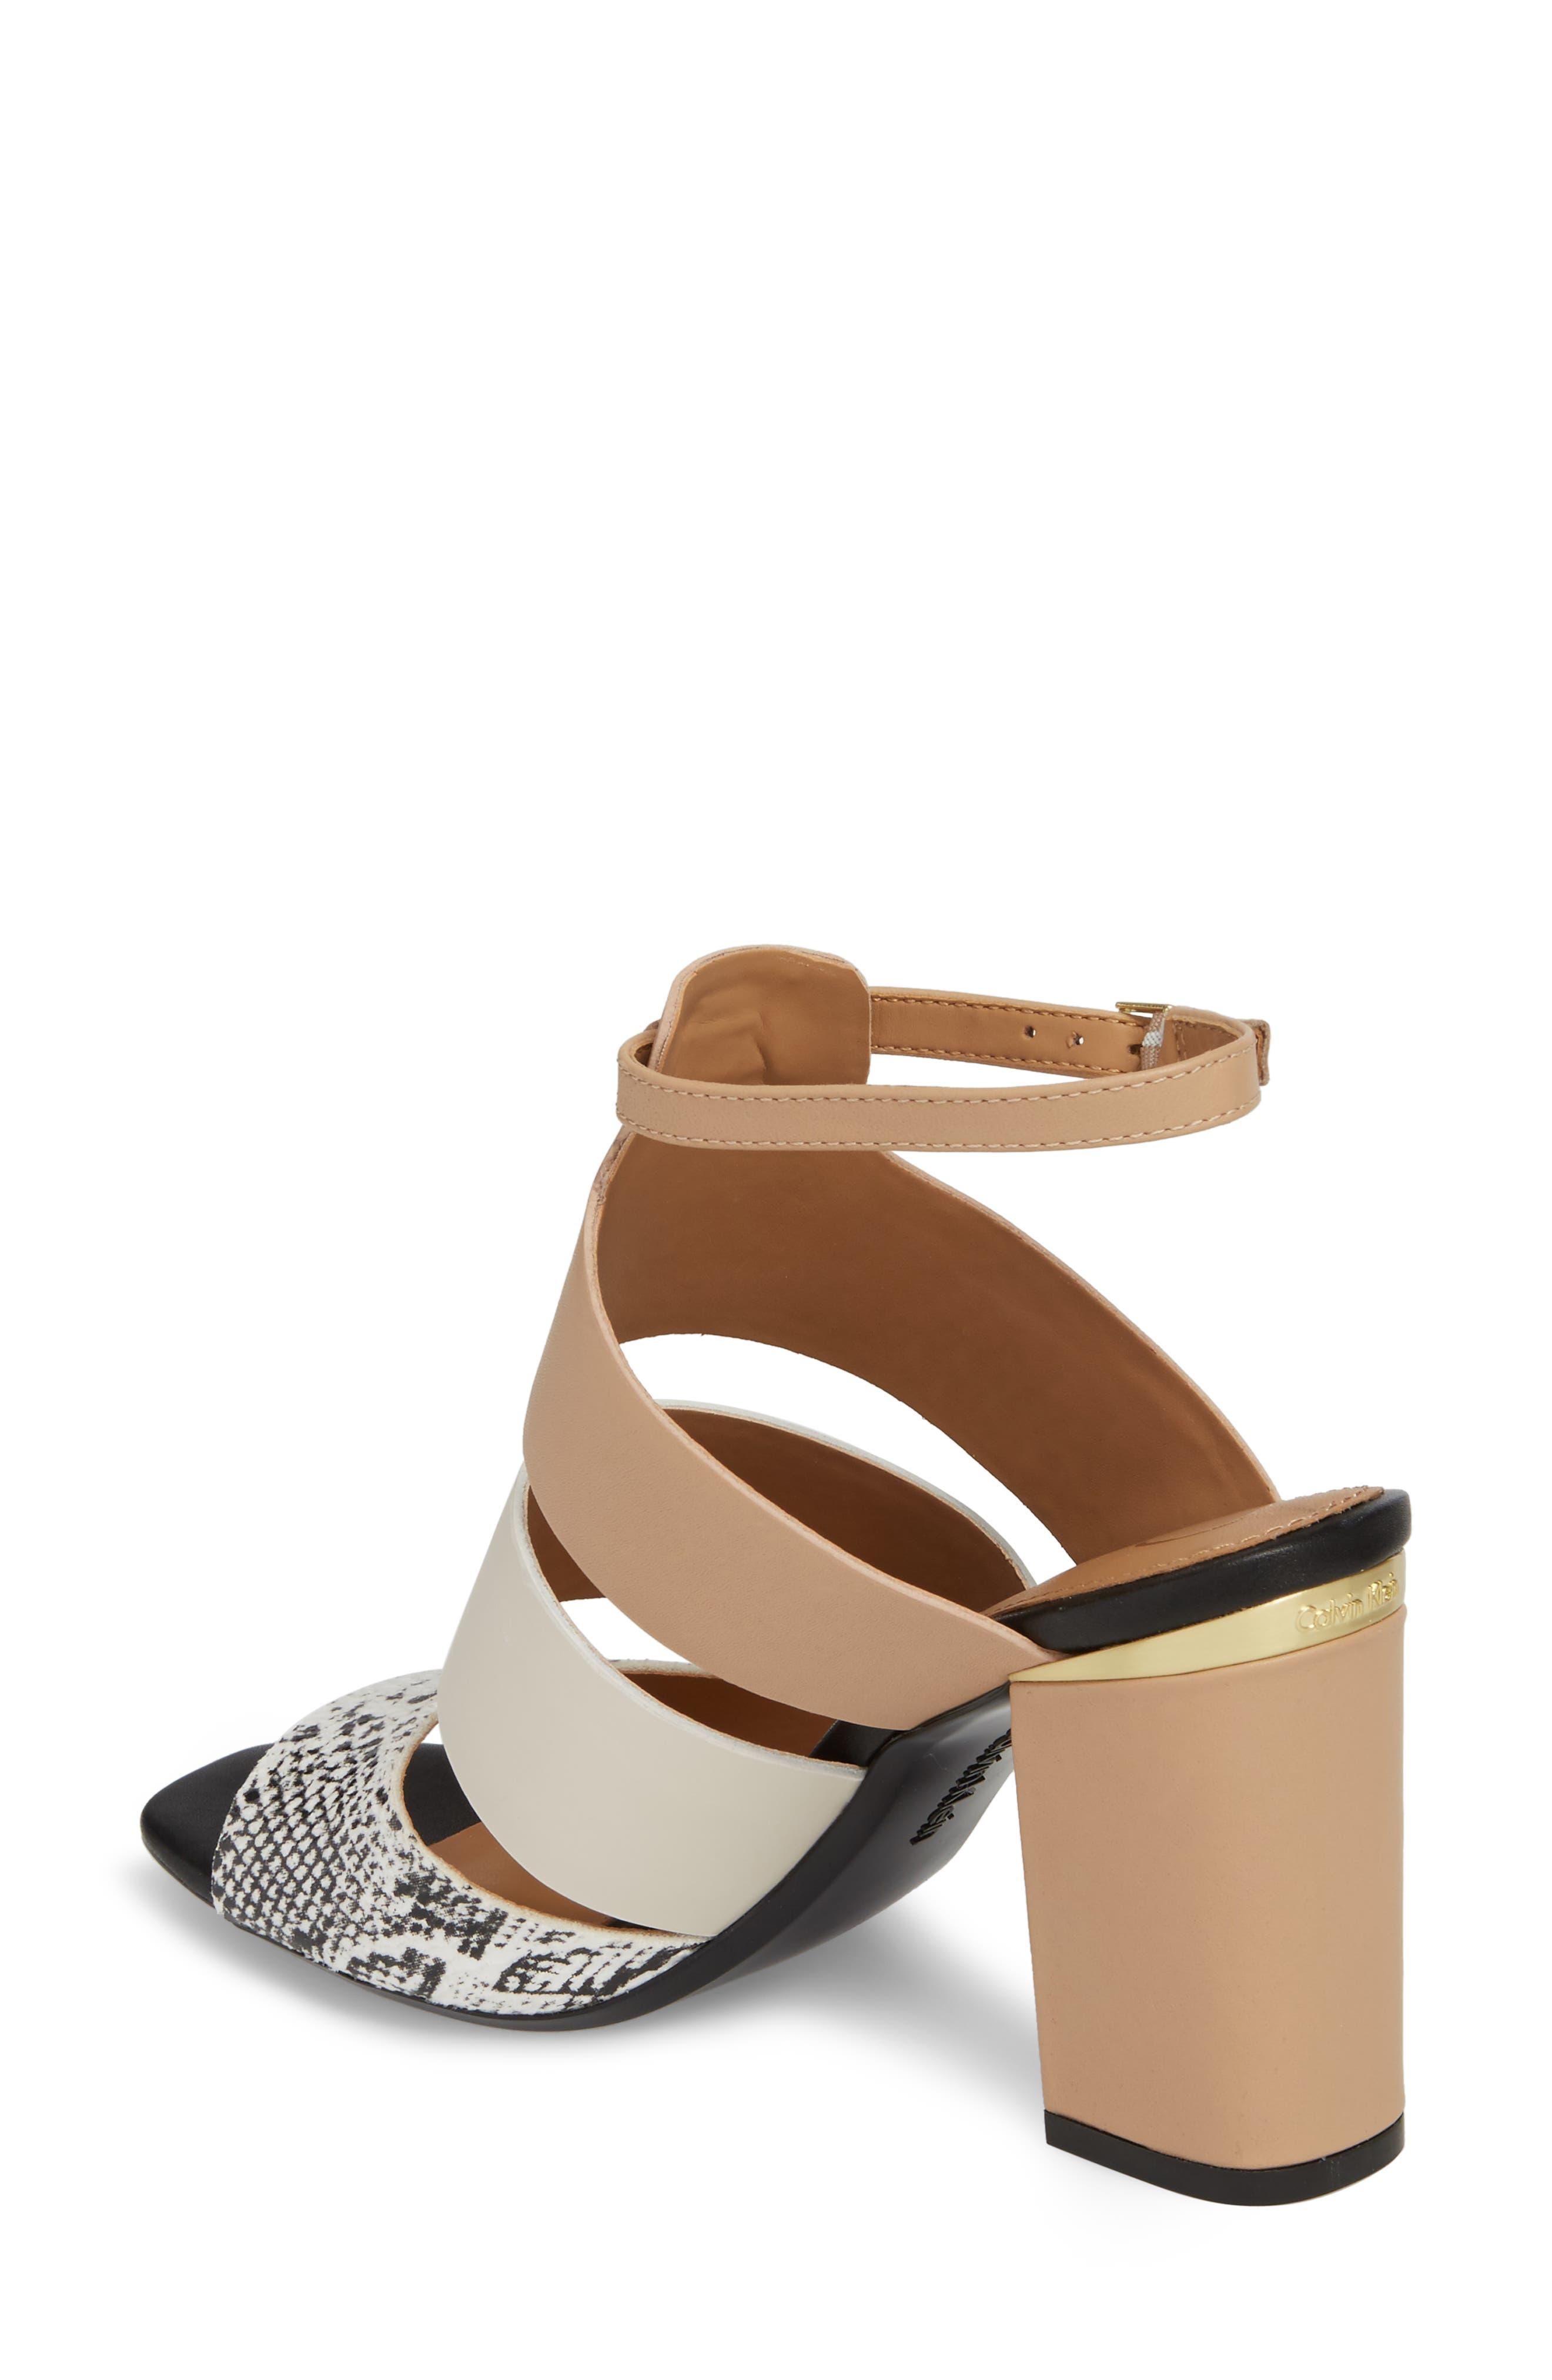 Caran Block Heel Sandal,                             Alternate thumbnail 2, color,                             BLACK/ WHITE LEATHER